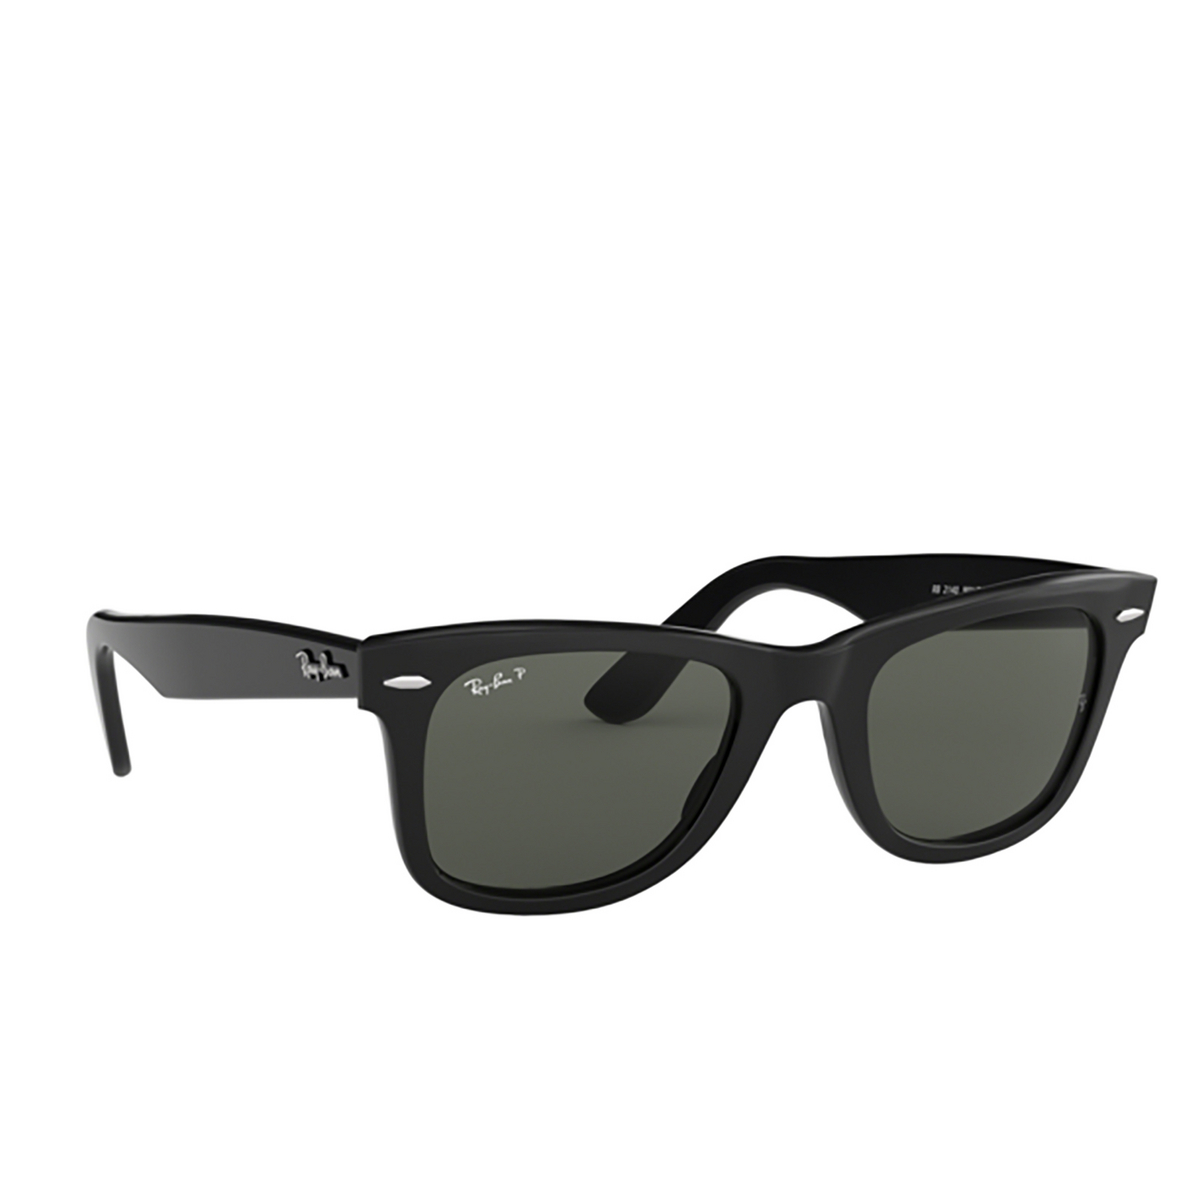 Ray-Ban® Square Sunglasses: Wayfarer RB2140 color Black 901/58 - 2/3.